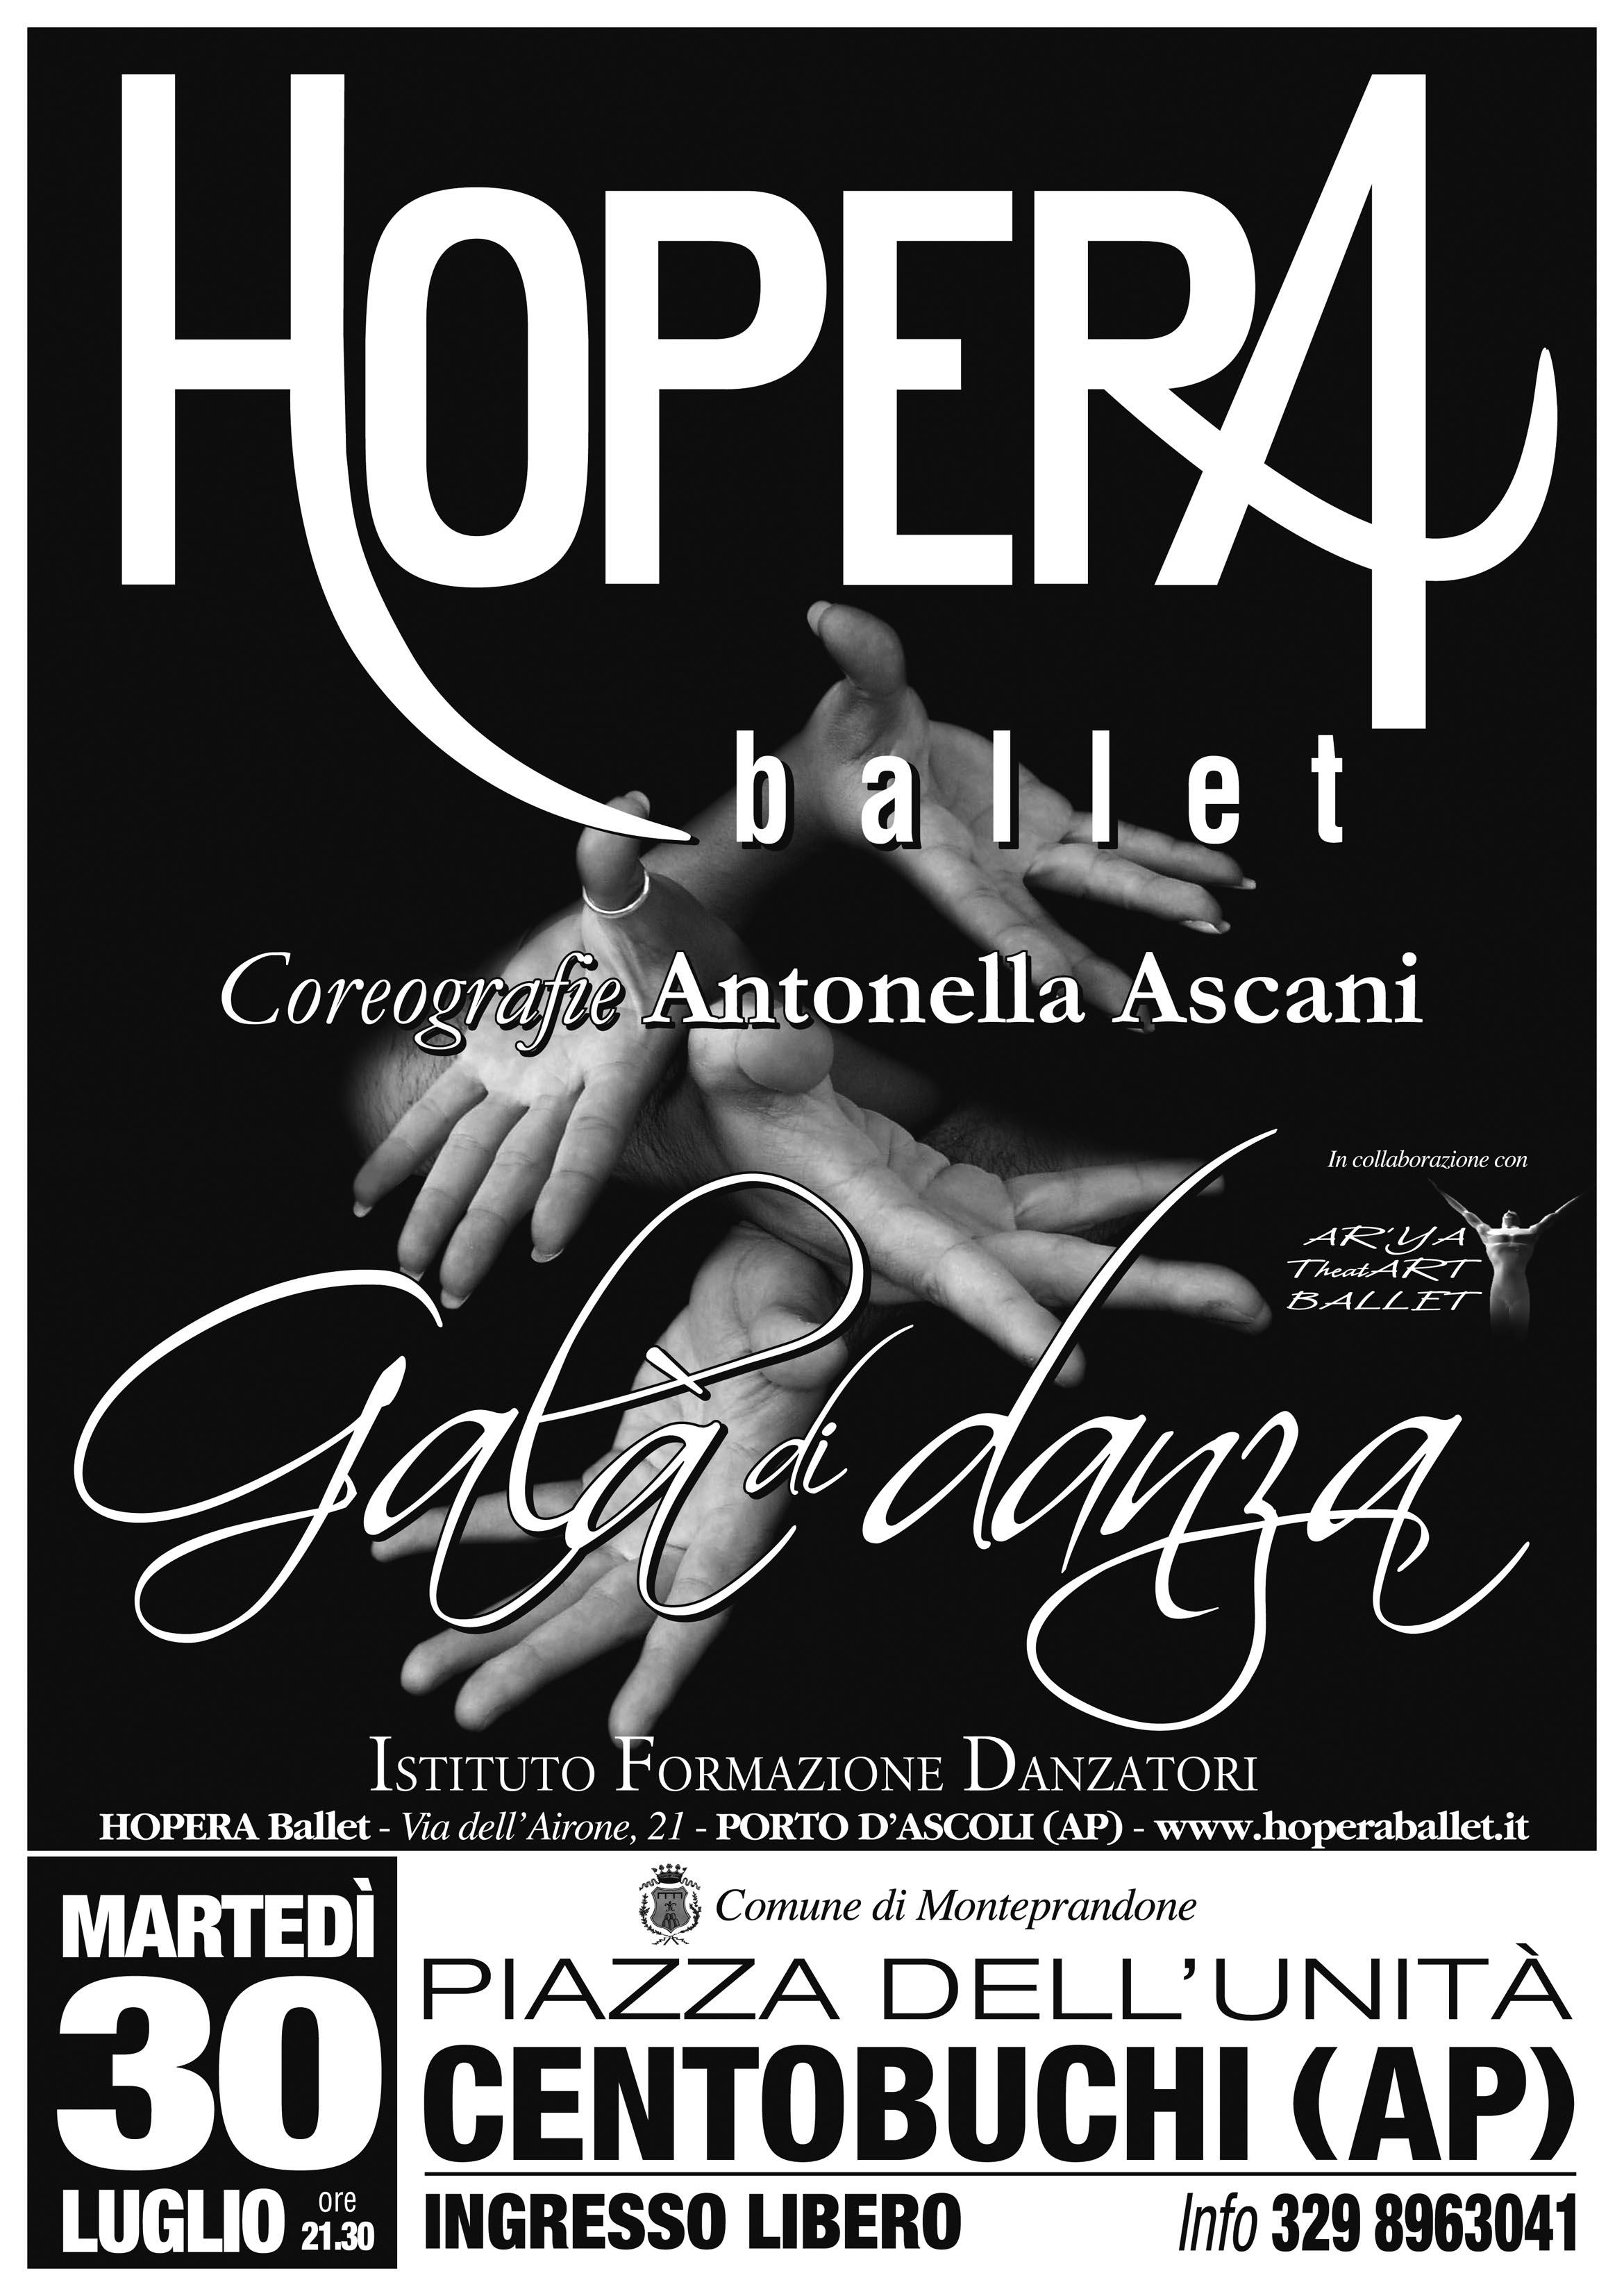 Hopera Ballet